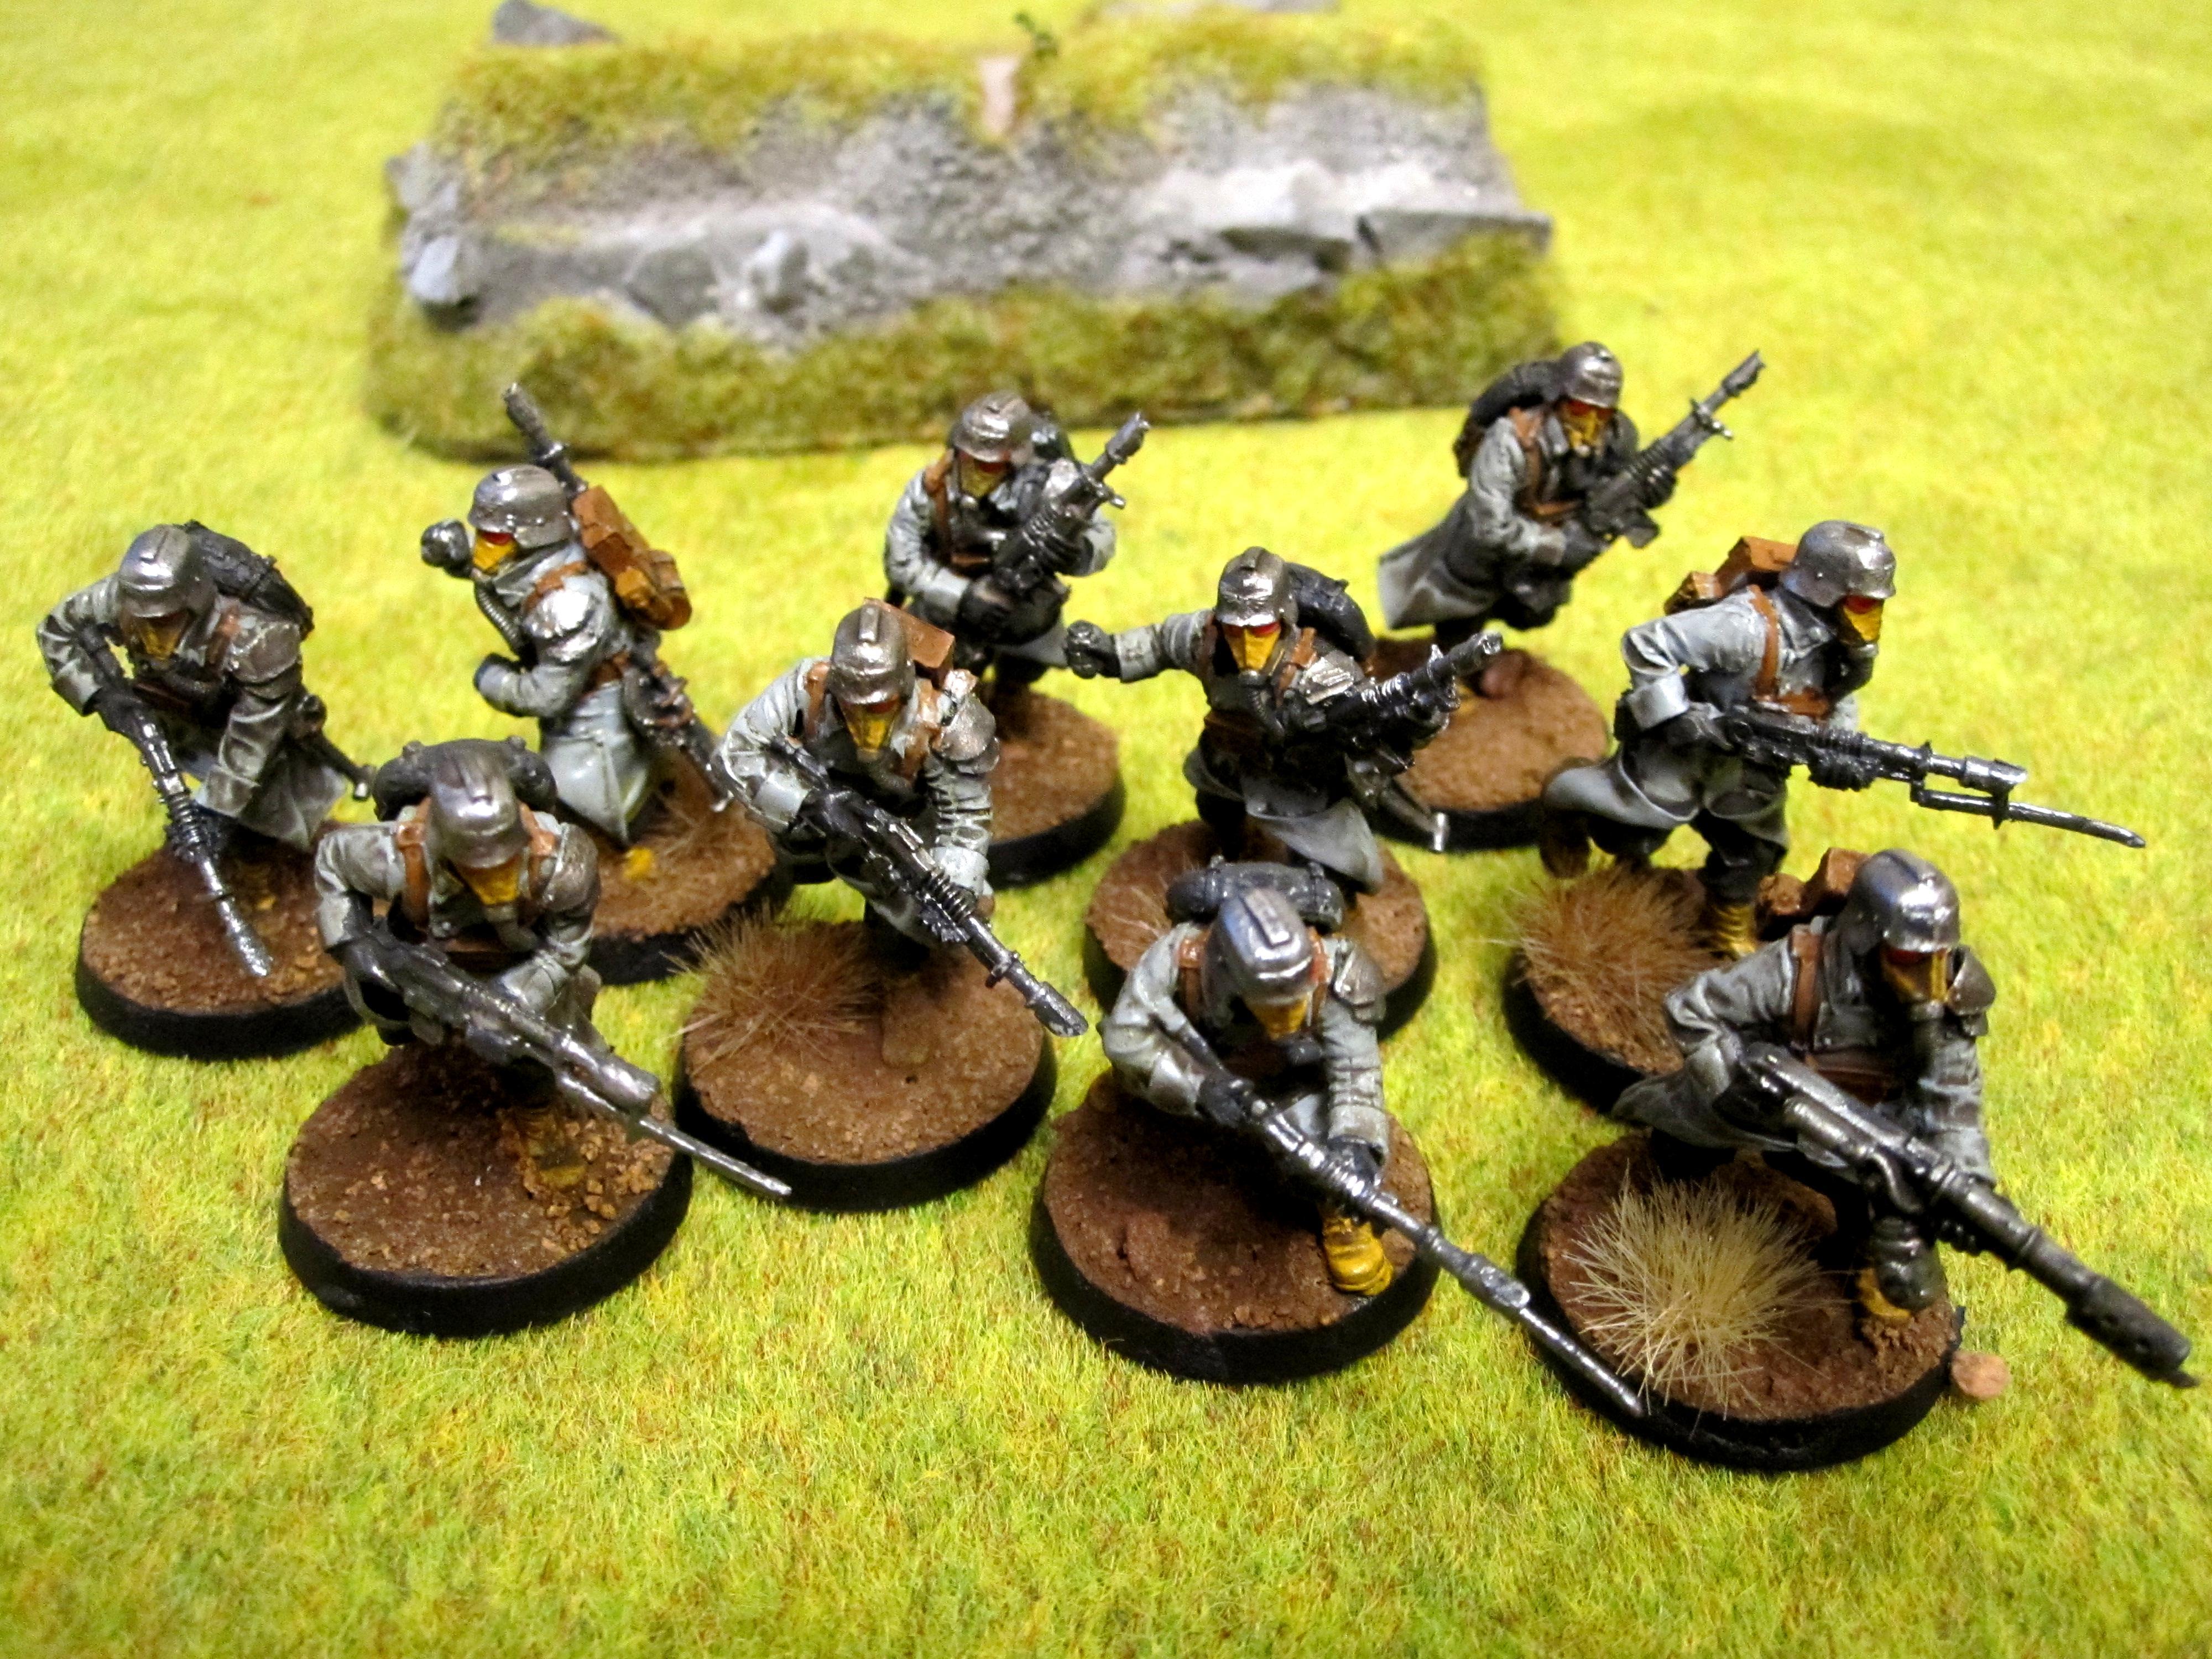 Death, Death Korps of Krieg, Forge, Infantry, Korps, Platoon, World